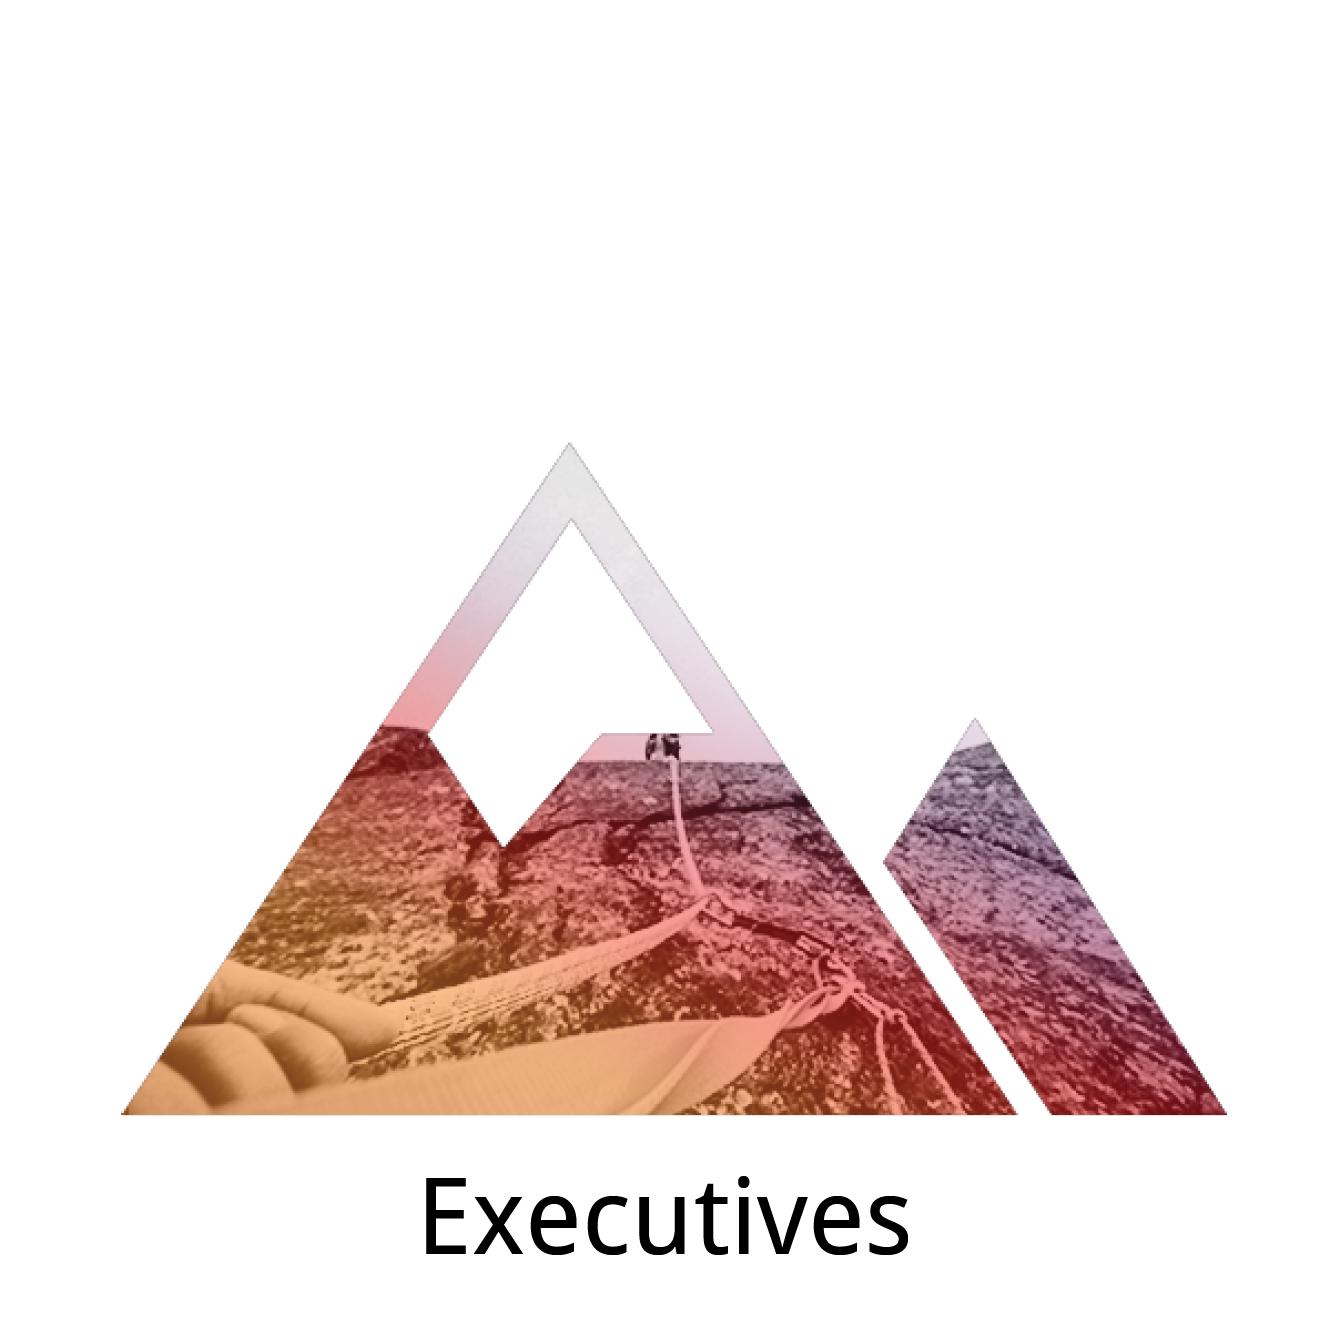 Executives gateway.png